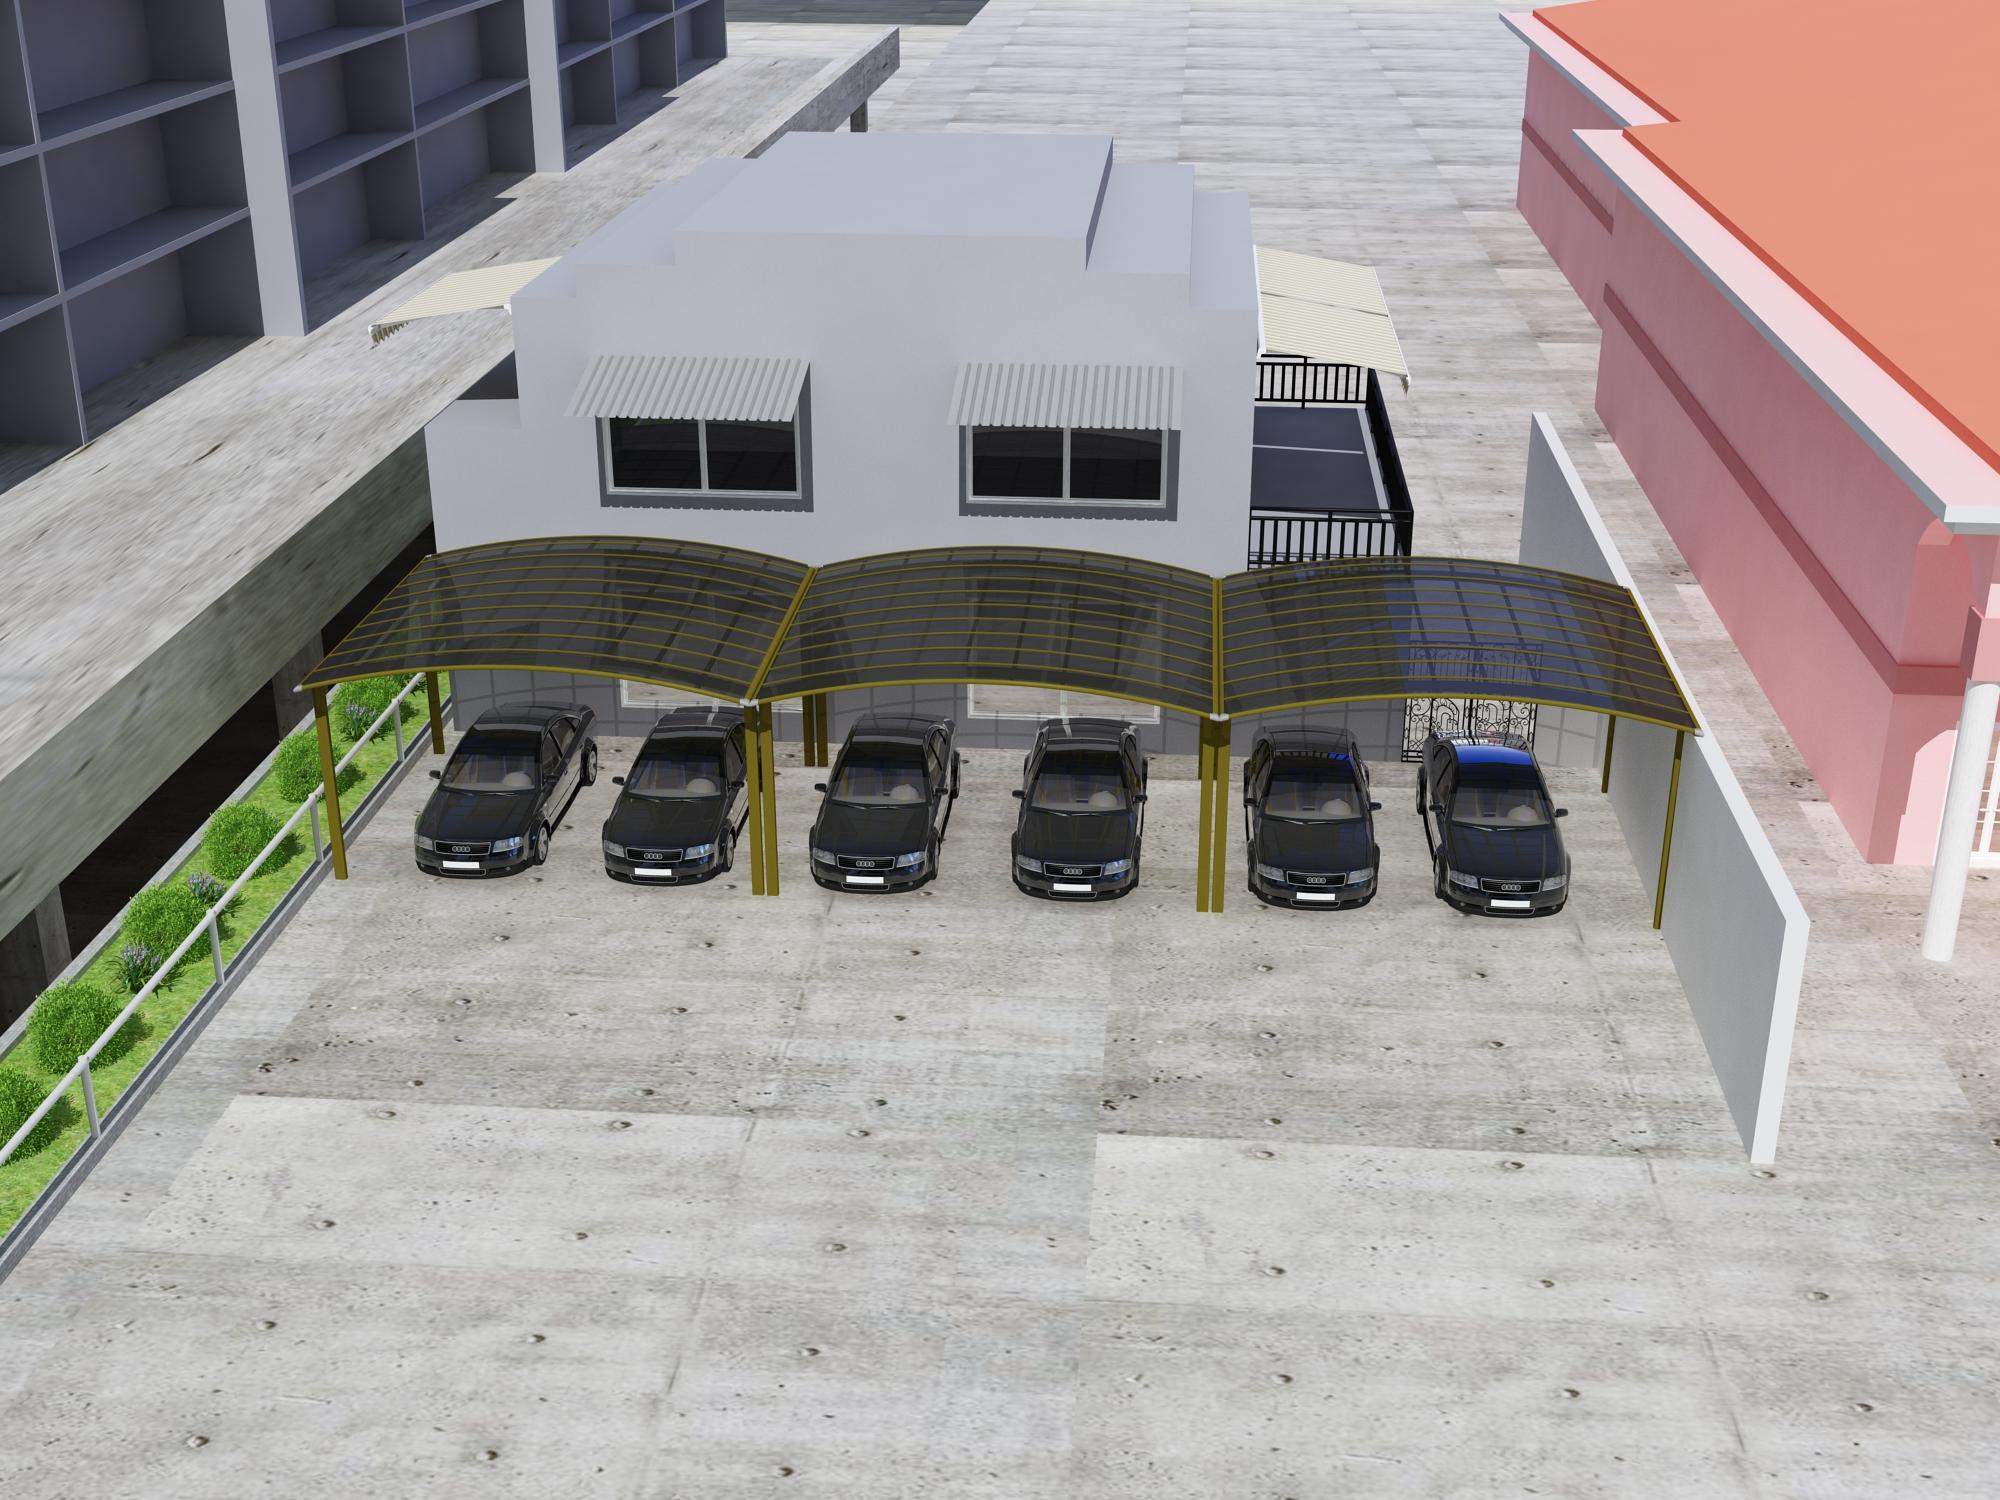 Comercial Carport visualization, aluminum and polycarbonate panels